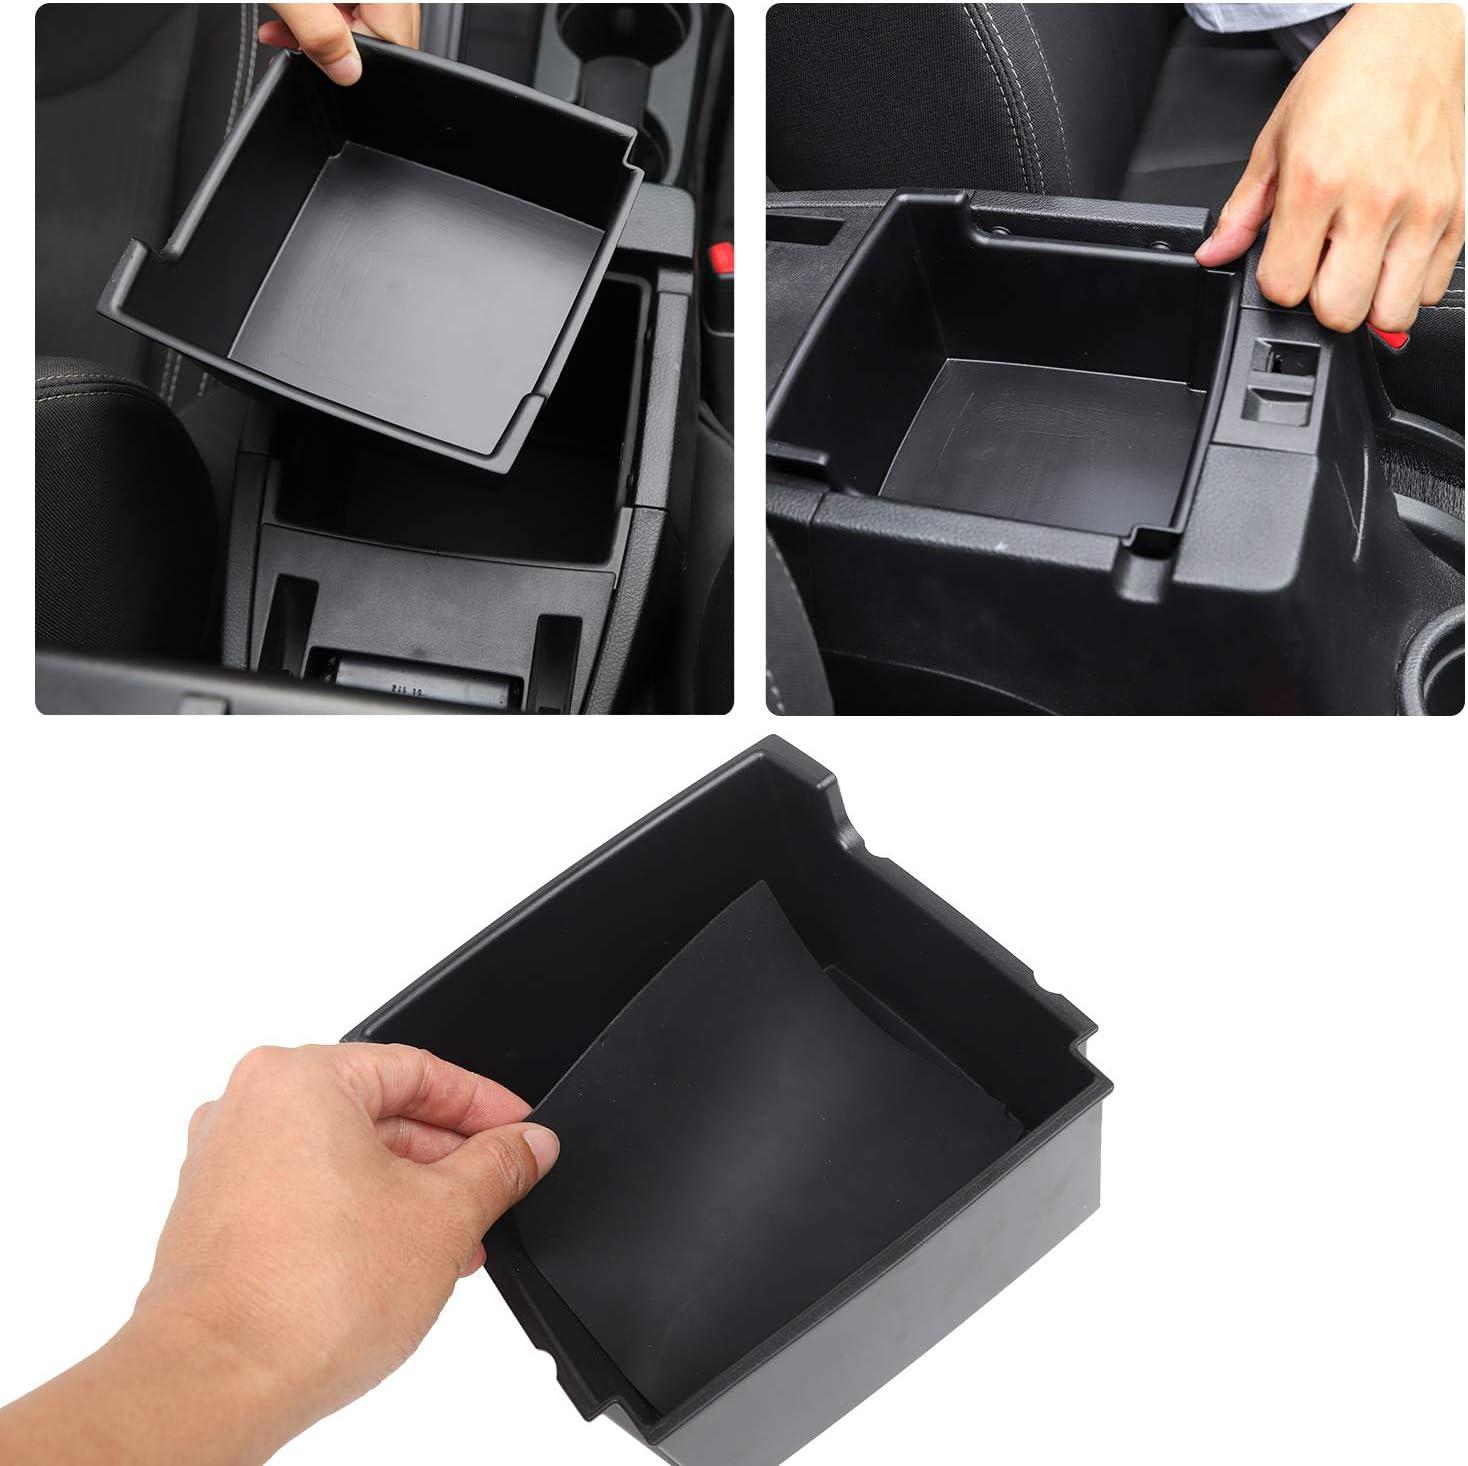 RT-TCZ for Jeep JK Center Console Insert Grab Tray Passenger Storage Tray Organizer Grab Handle Storage Box for 2011-2018 Jeep Wrangler JK JKU Black+